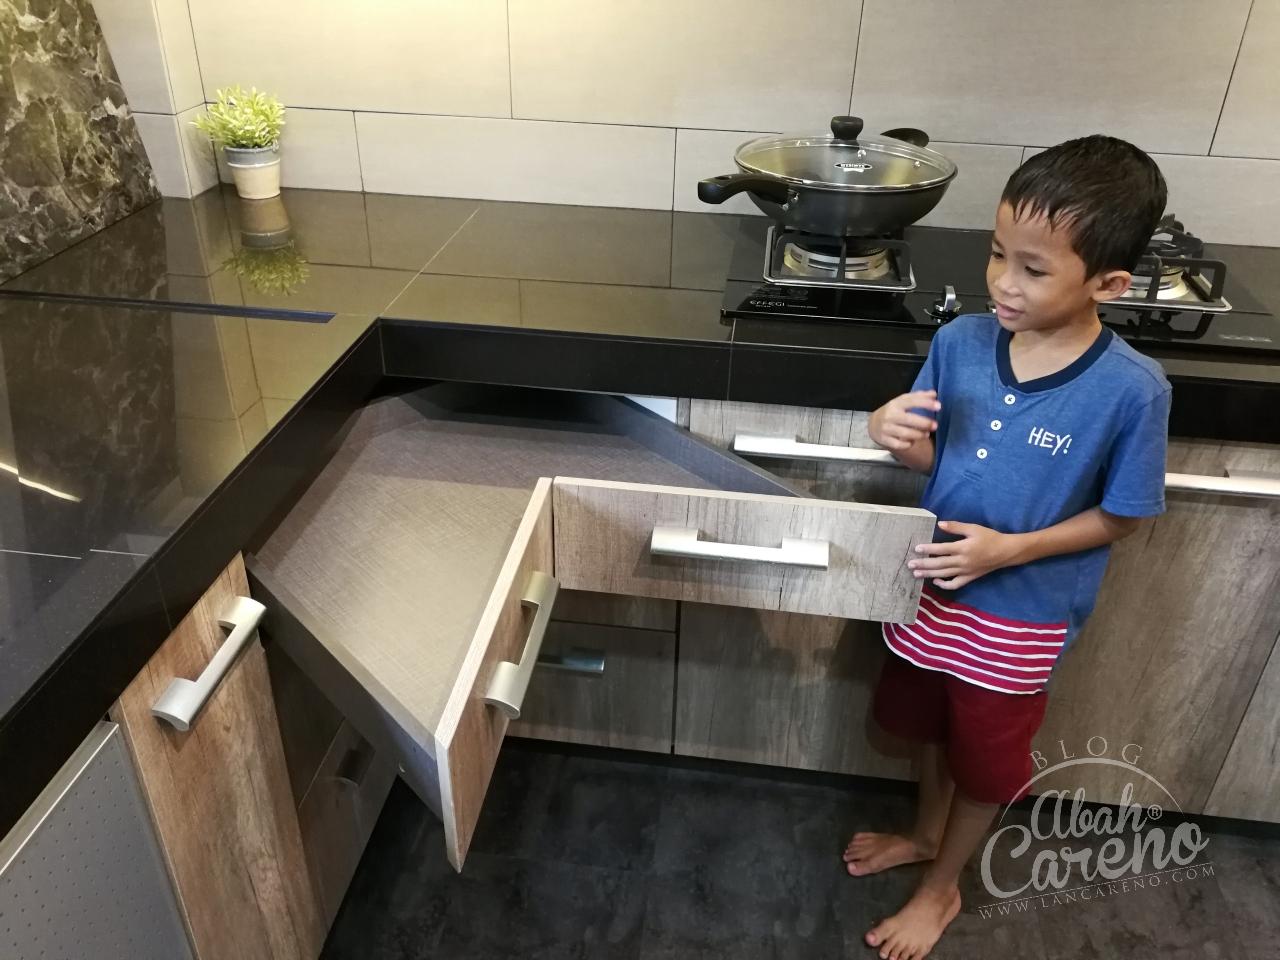 Kabinet Dapur Dari Intech Kitchen Tawar Harga Kilang Paling Murah Blog Abah Careno